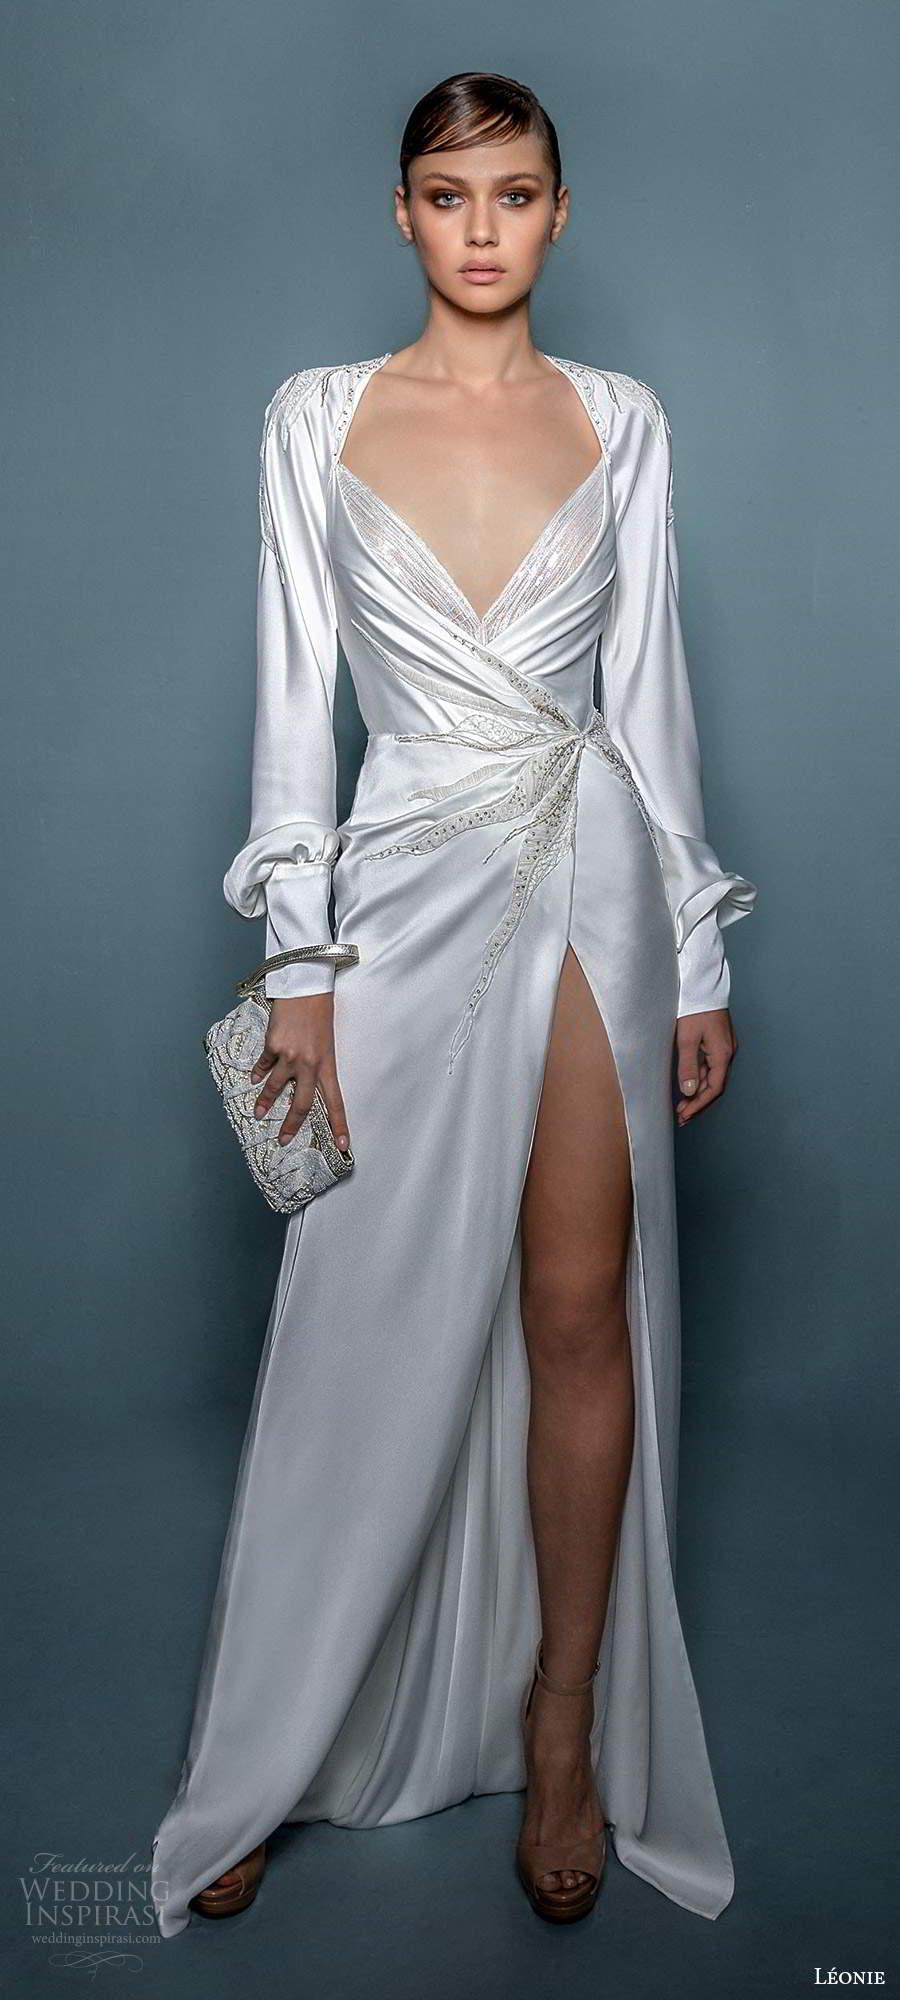 leonie bridal 2020 bridal long cuff sleeves queen anne neckline ruched bodice sheath wedding dress slit skirt (8) mv